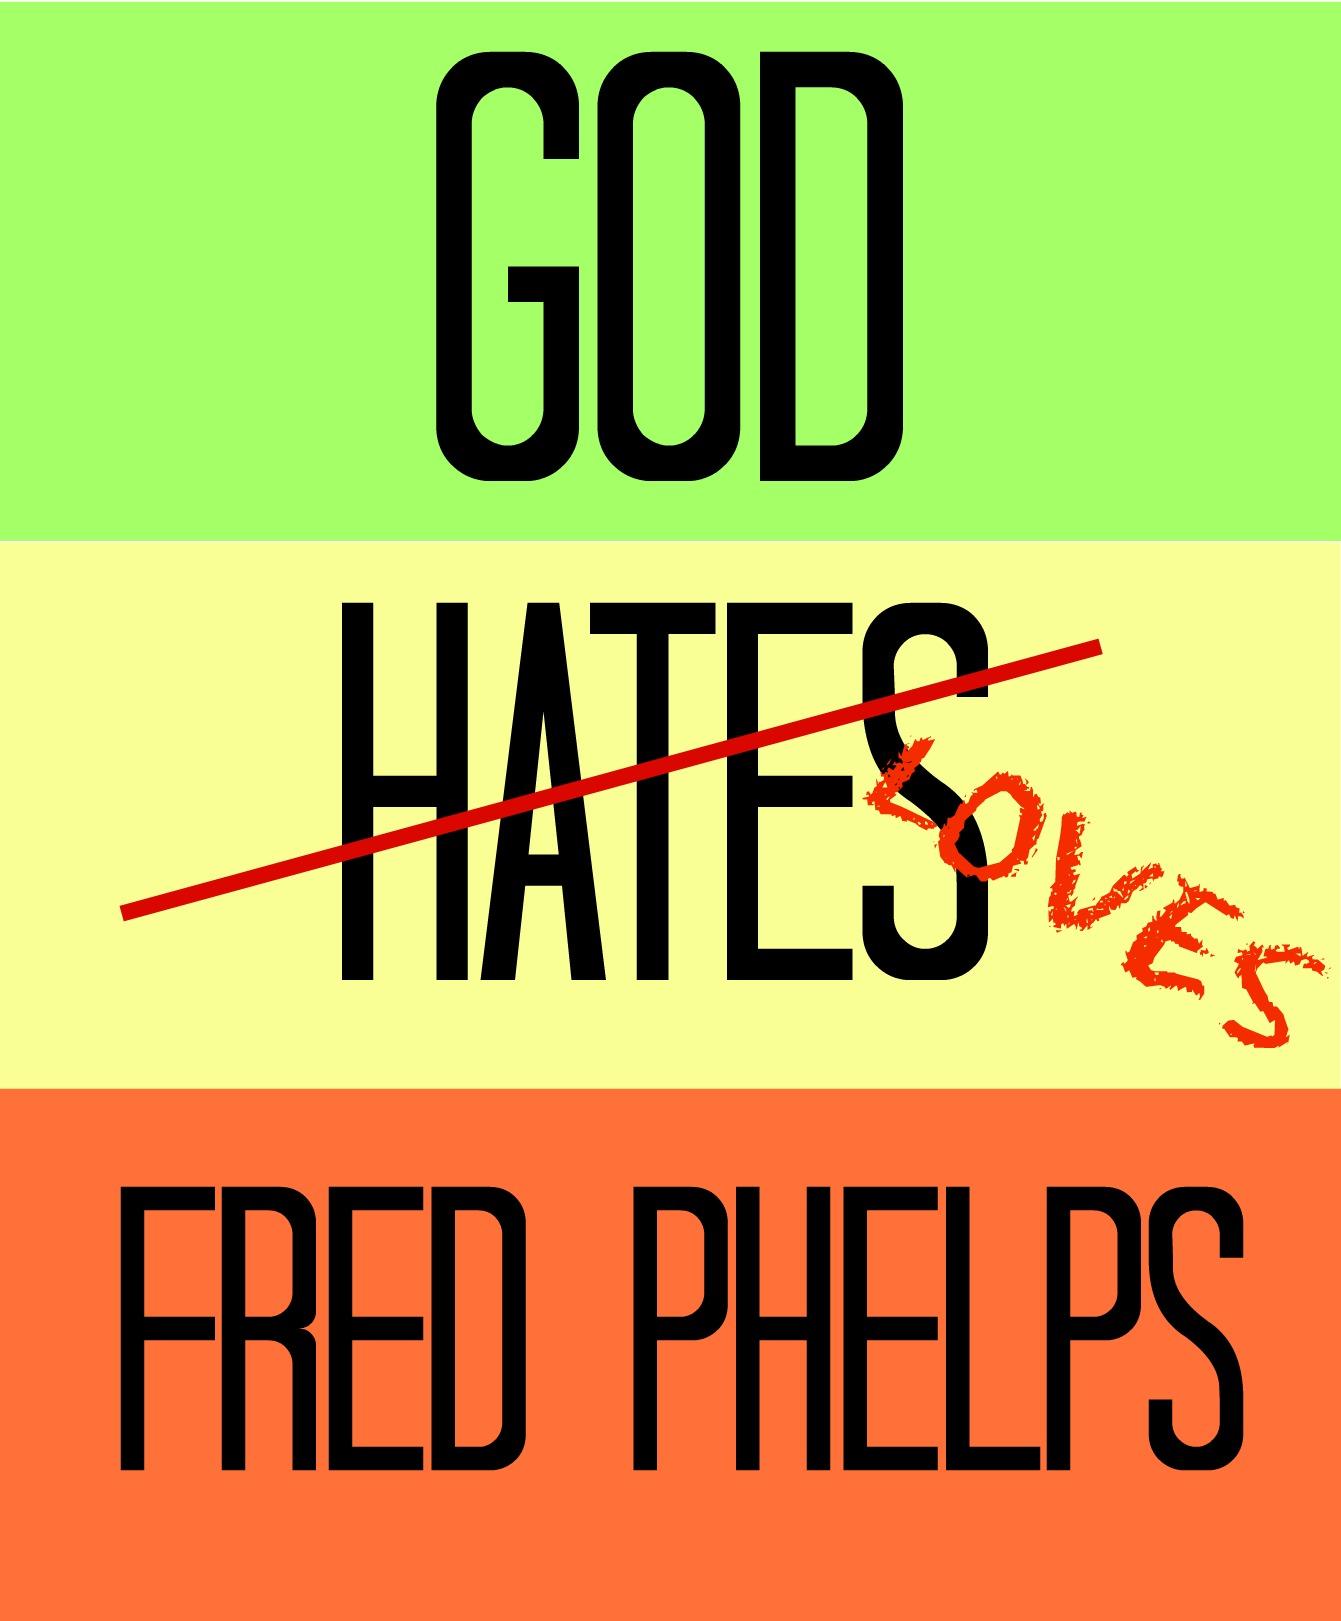 God Hates Loves Fred Phelps